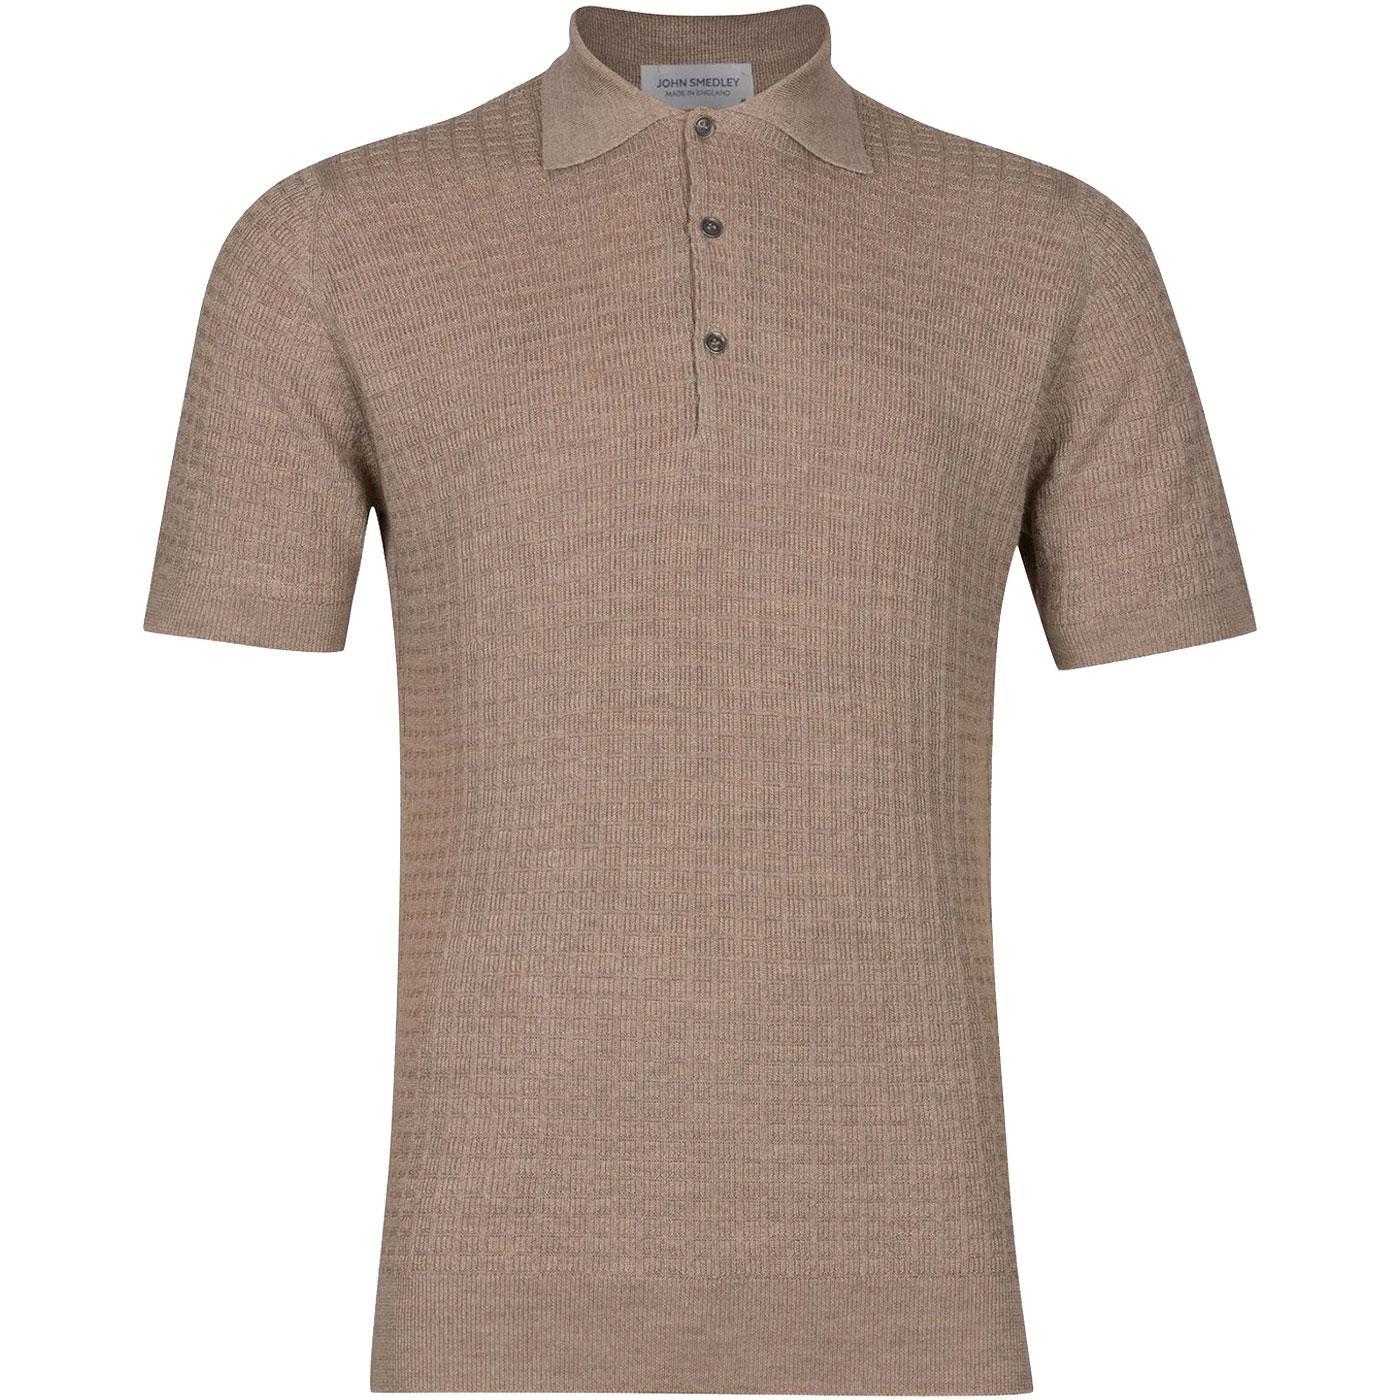 Brushwood JOHN SMEDLEY Wool Texture Knit Mod Polo